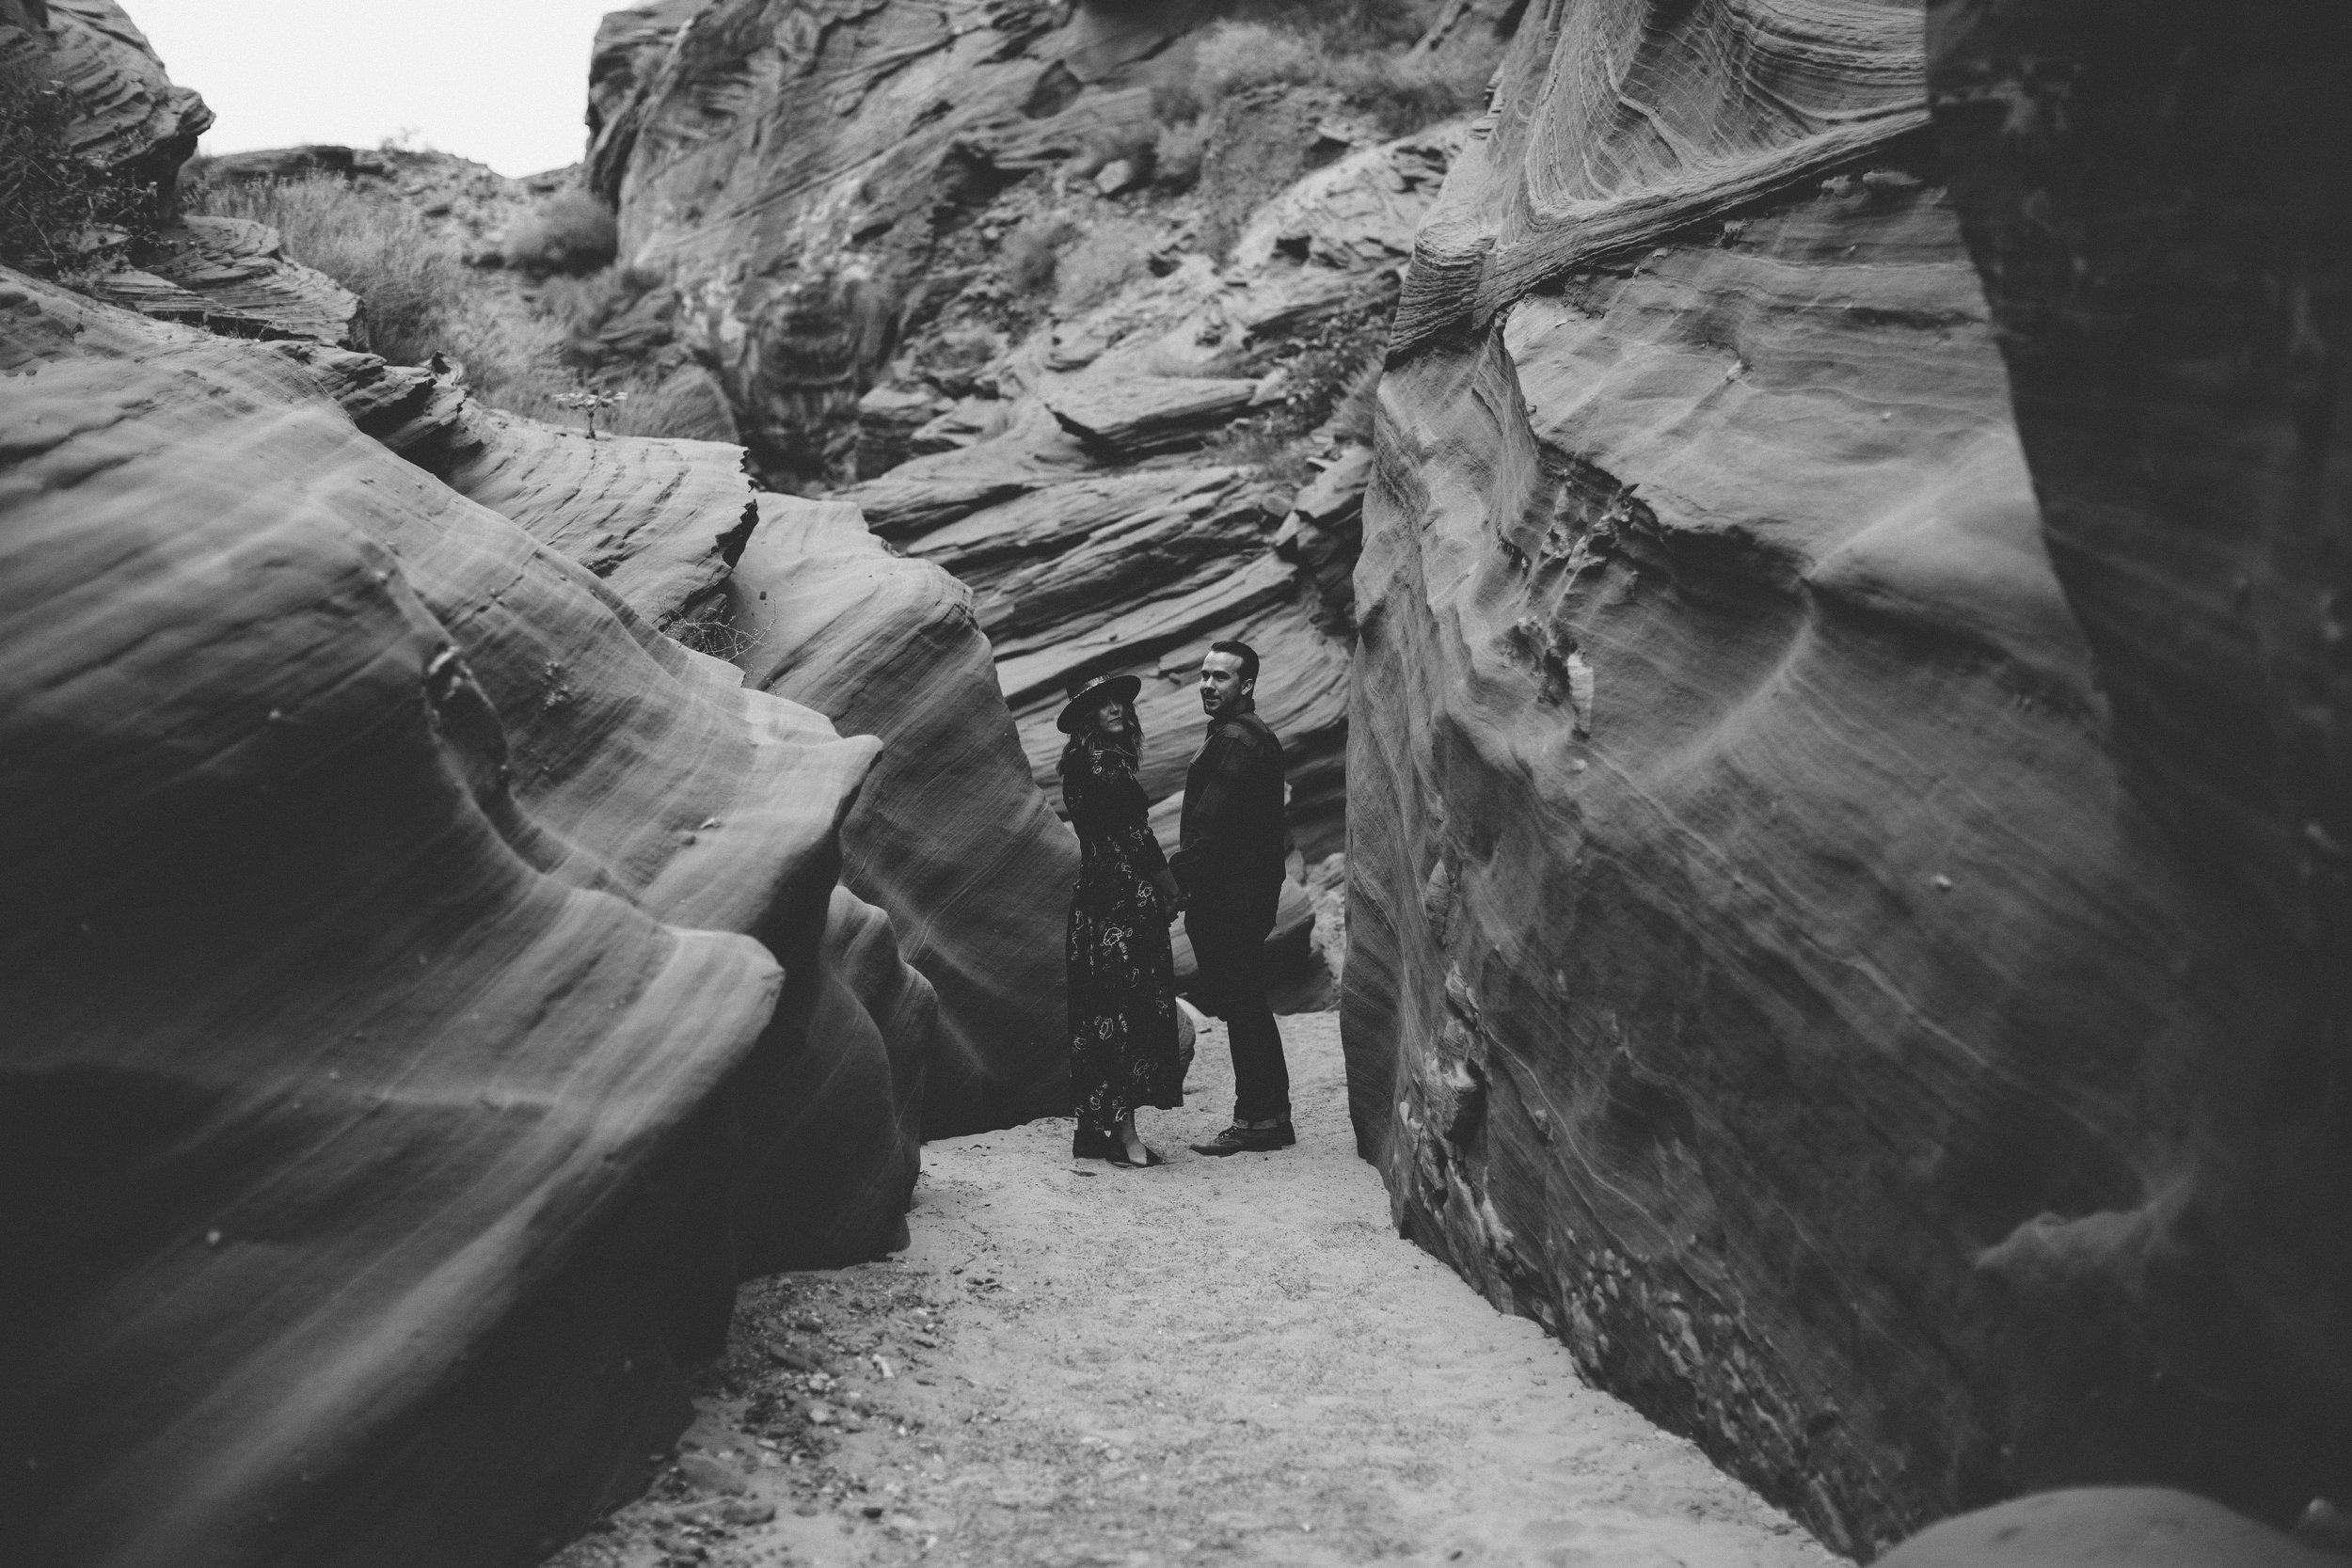 Arizona Engagement Photographer   Benjamin Hewitt Photography   Antelope Canyon - Waterhole Canyon